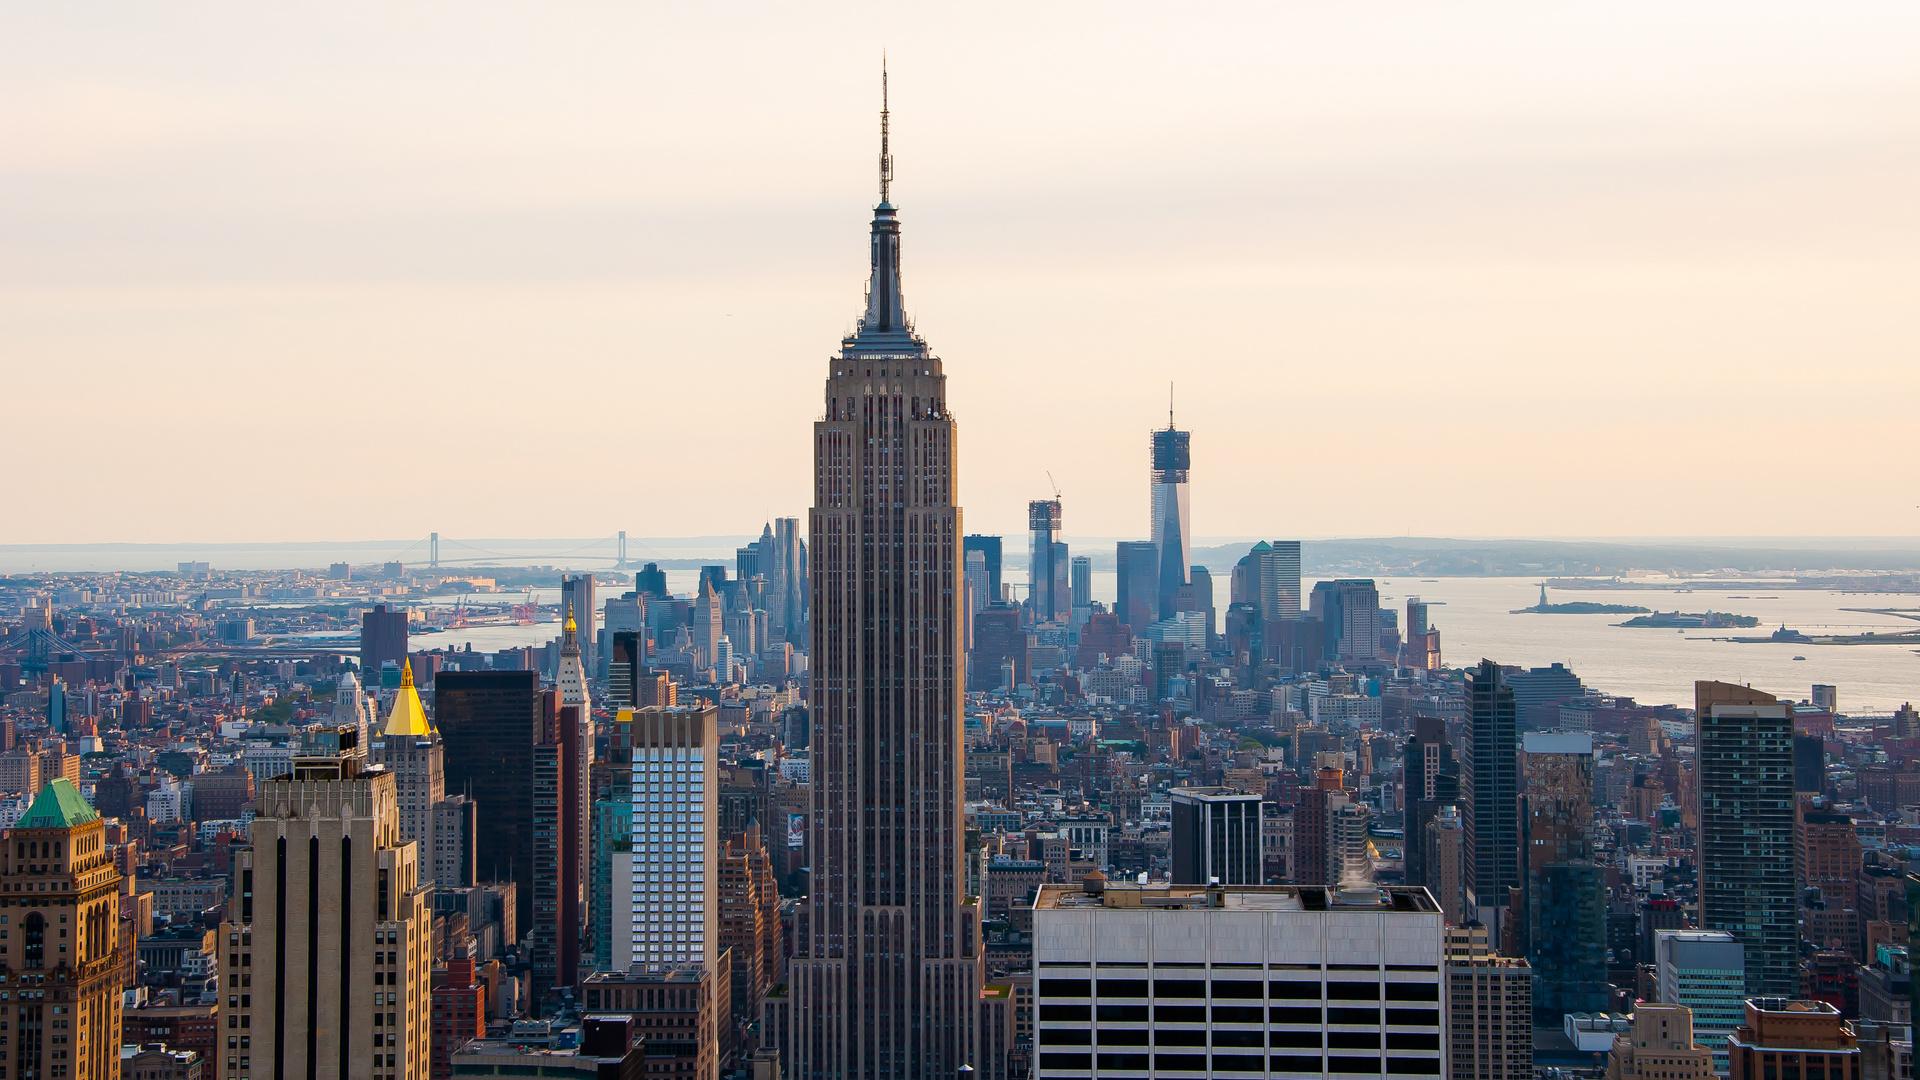 Skyline NYC - Rockefeller Center view